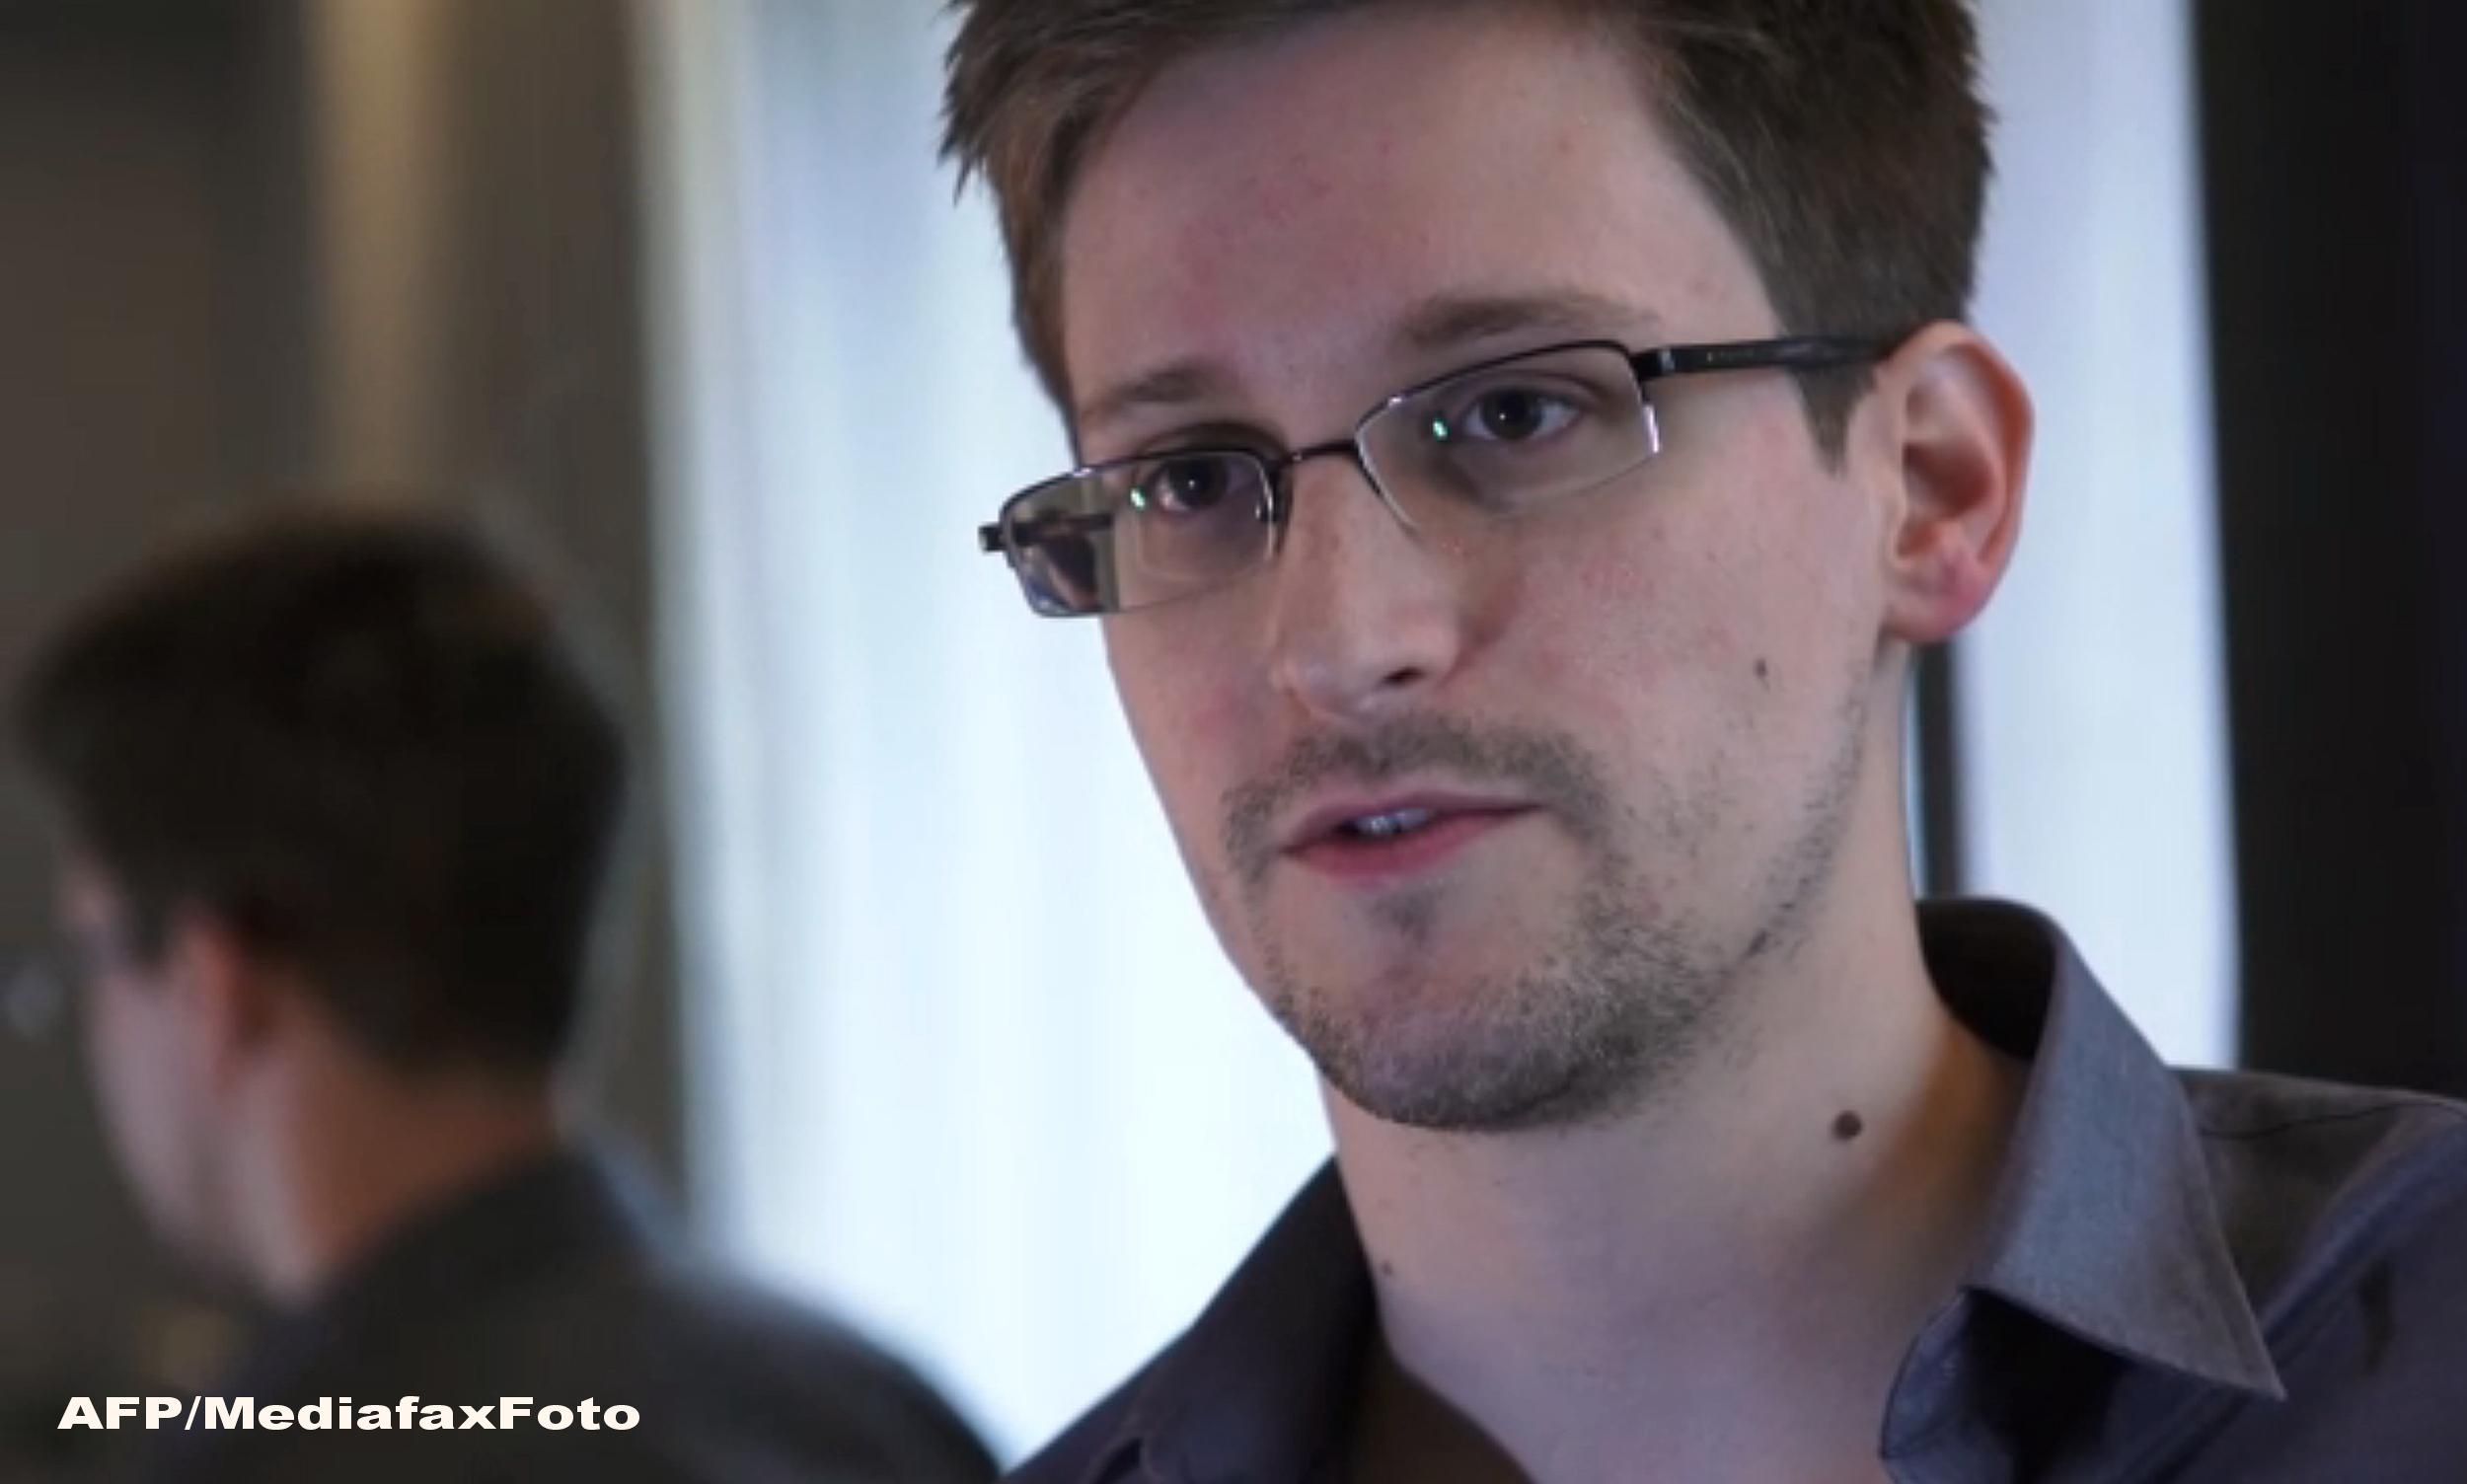 Oficialii agentiei NSA l-ar putea amnistia pe Edward Snowden daca primesc inapoi toate documentele